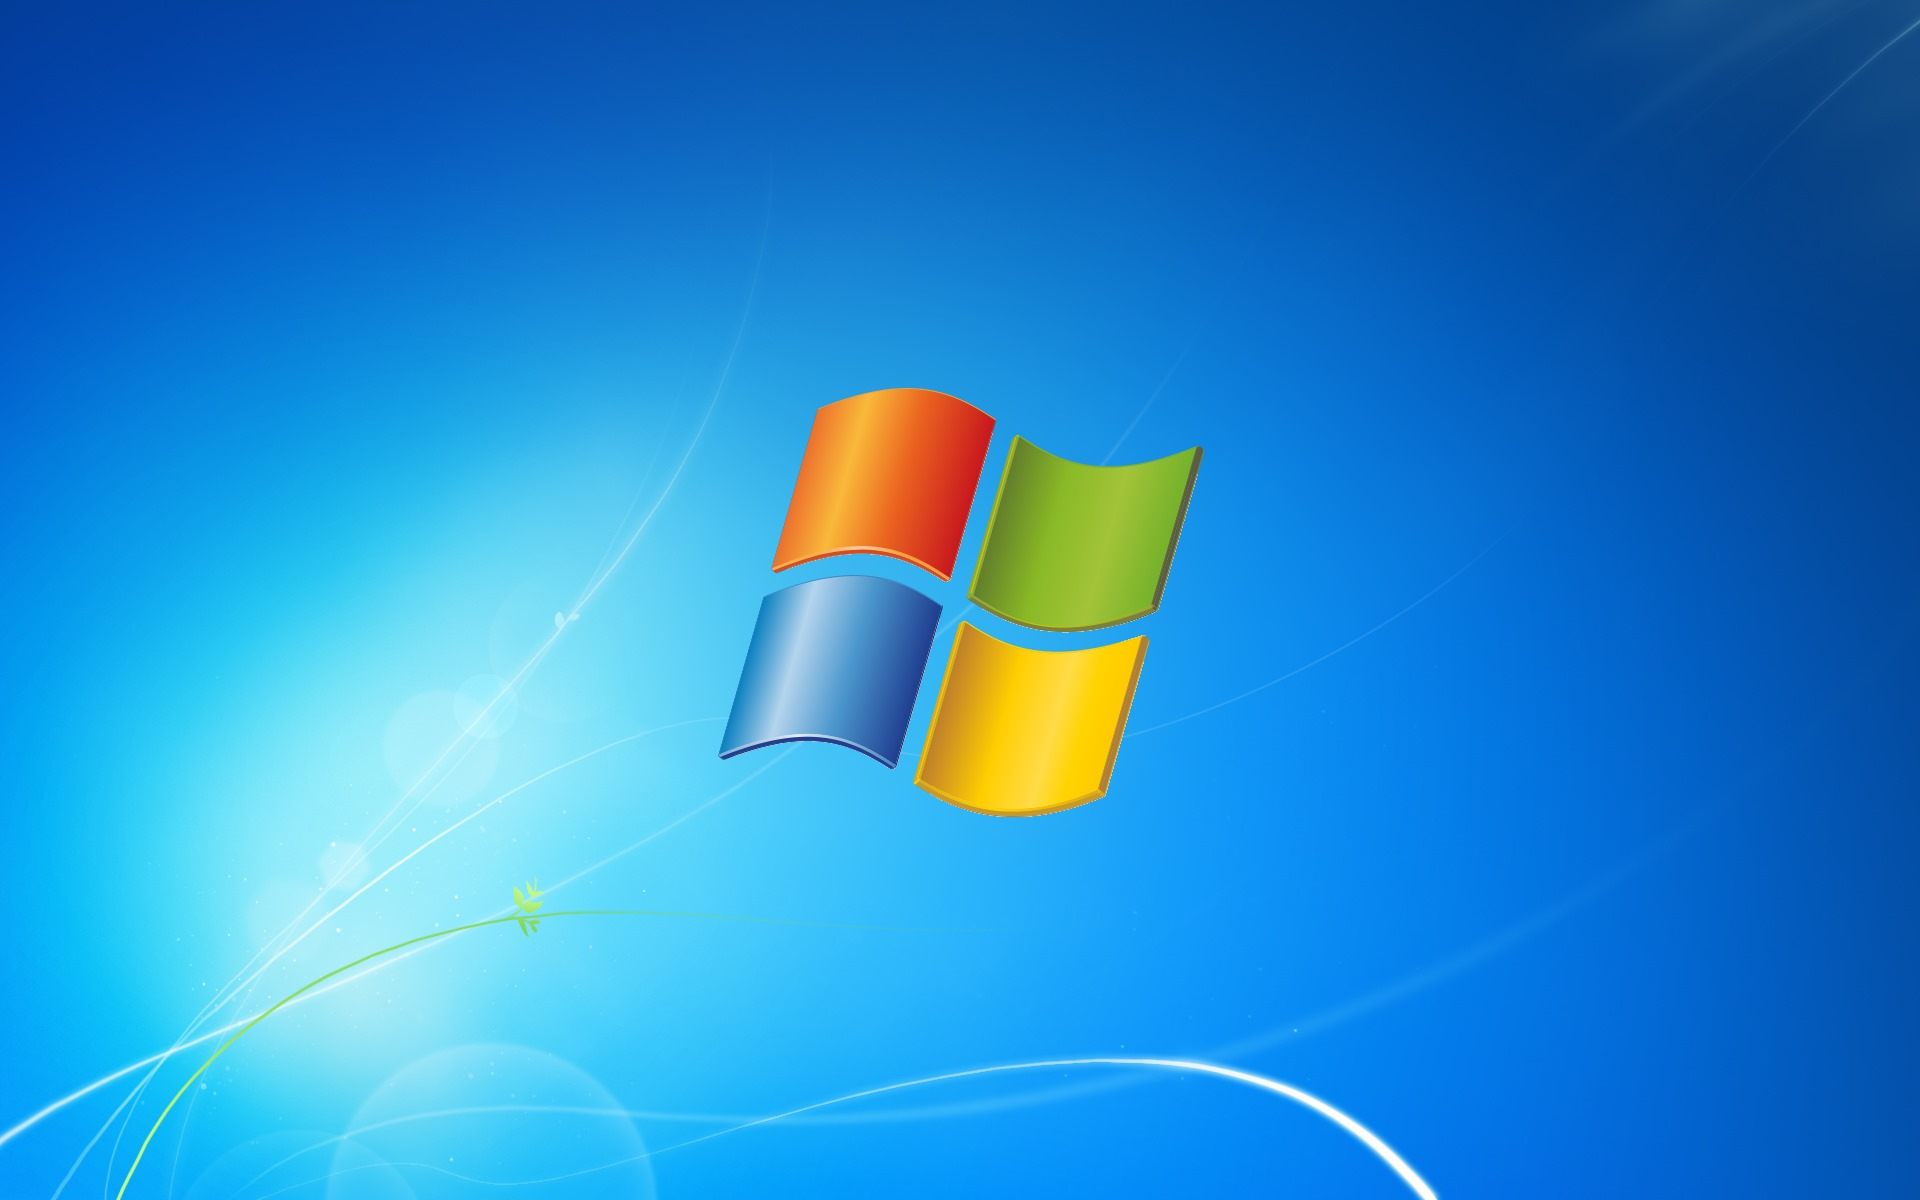 Windows Wallpaper Background